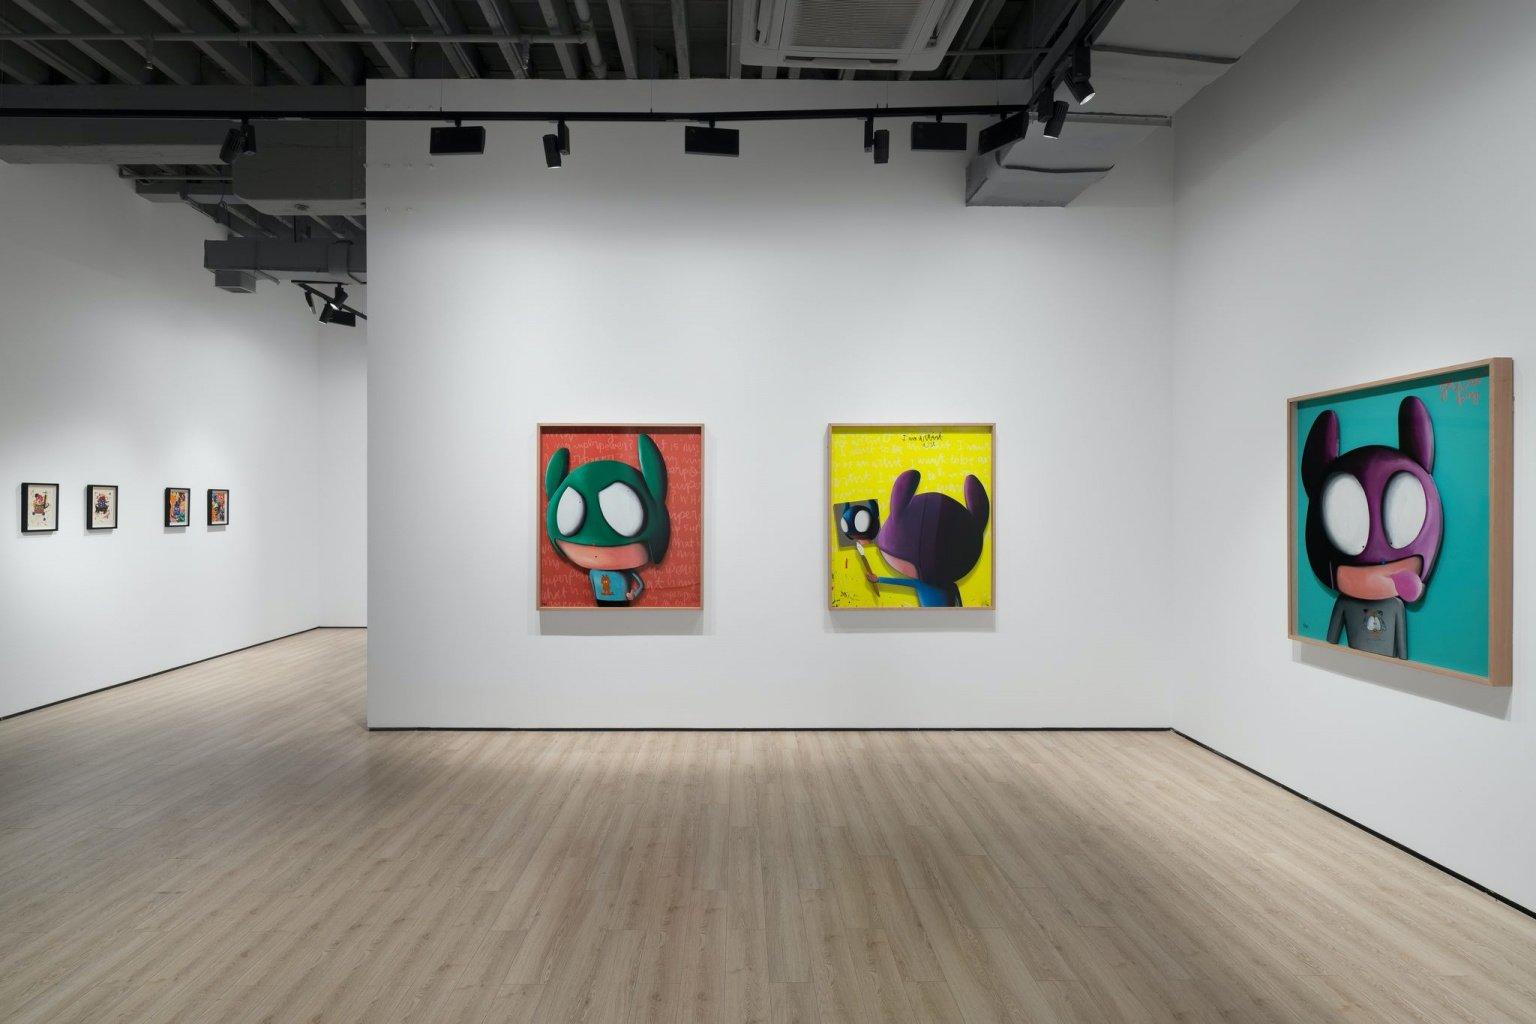 almine-rech-gallery-kawaii-installation-views-argsh-2021-48618jpg